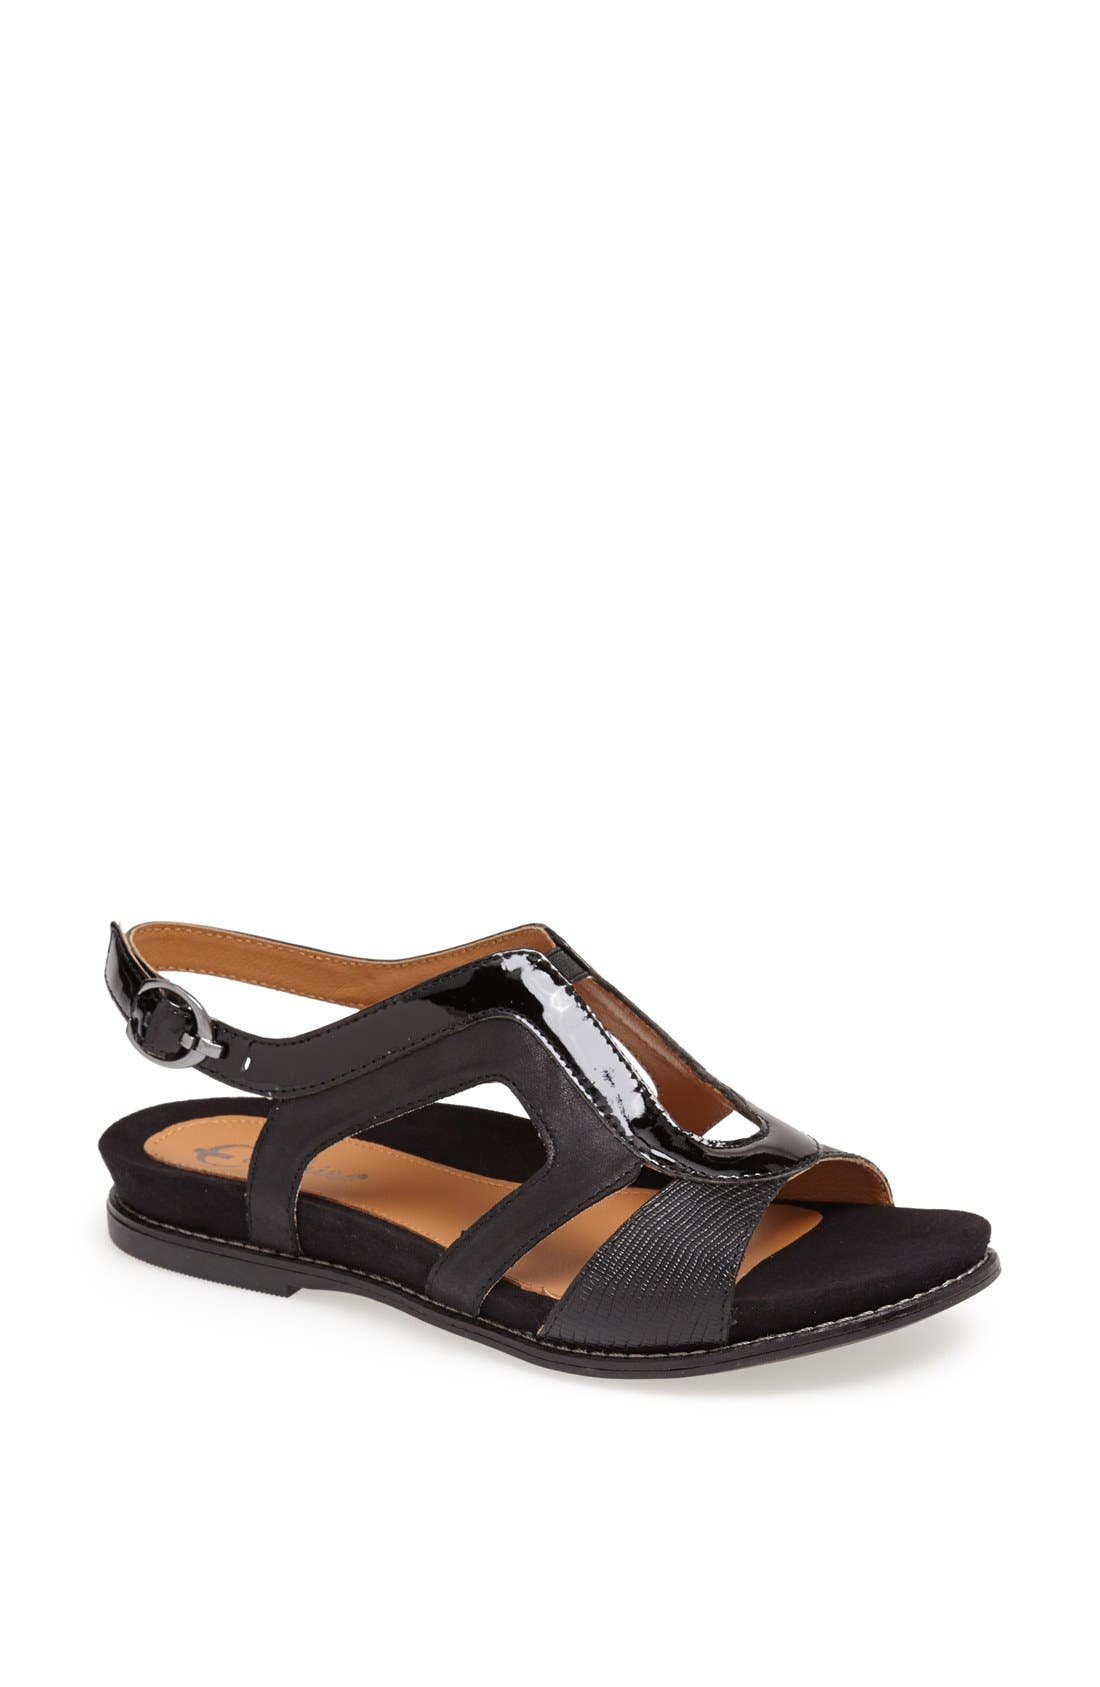 Alternate Image 1 Selected - Earthies® 'Arvello' Sandal